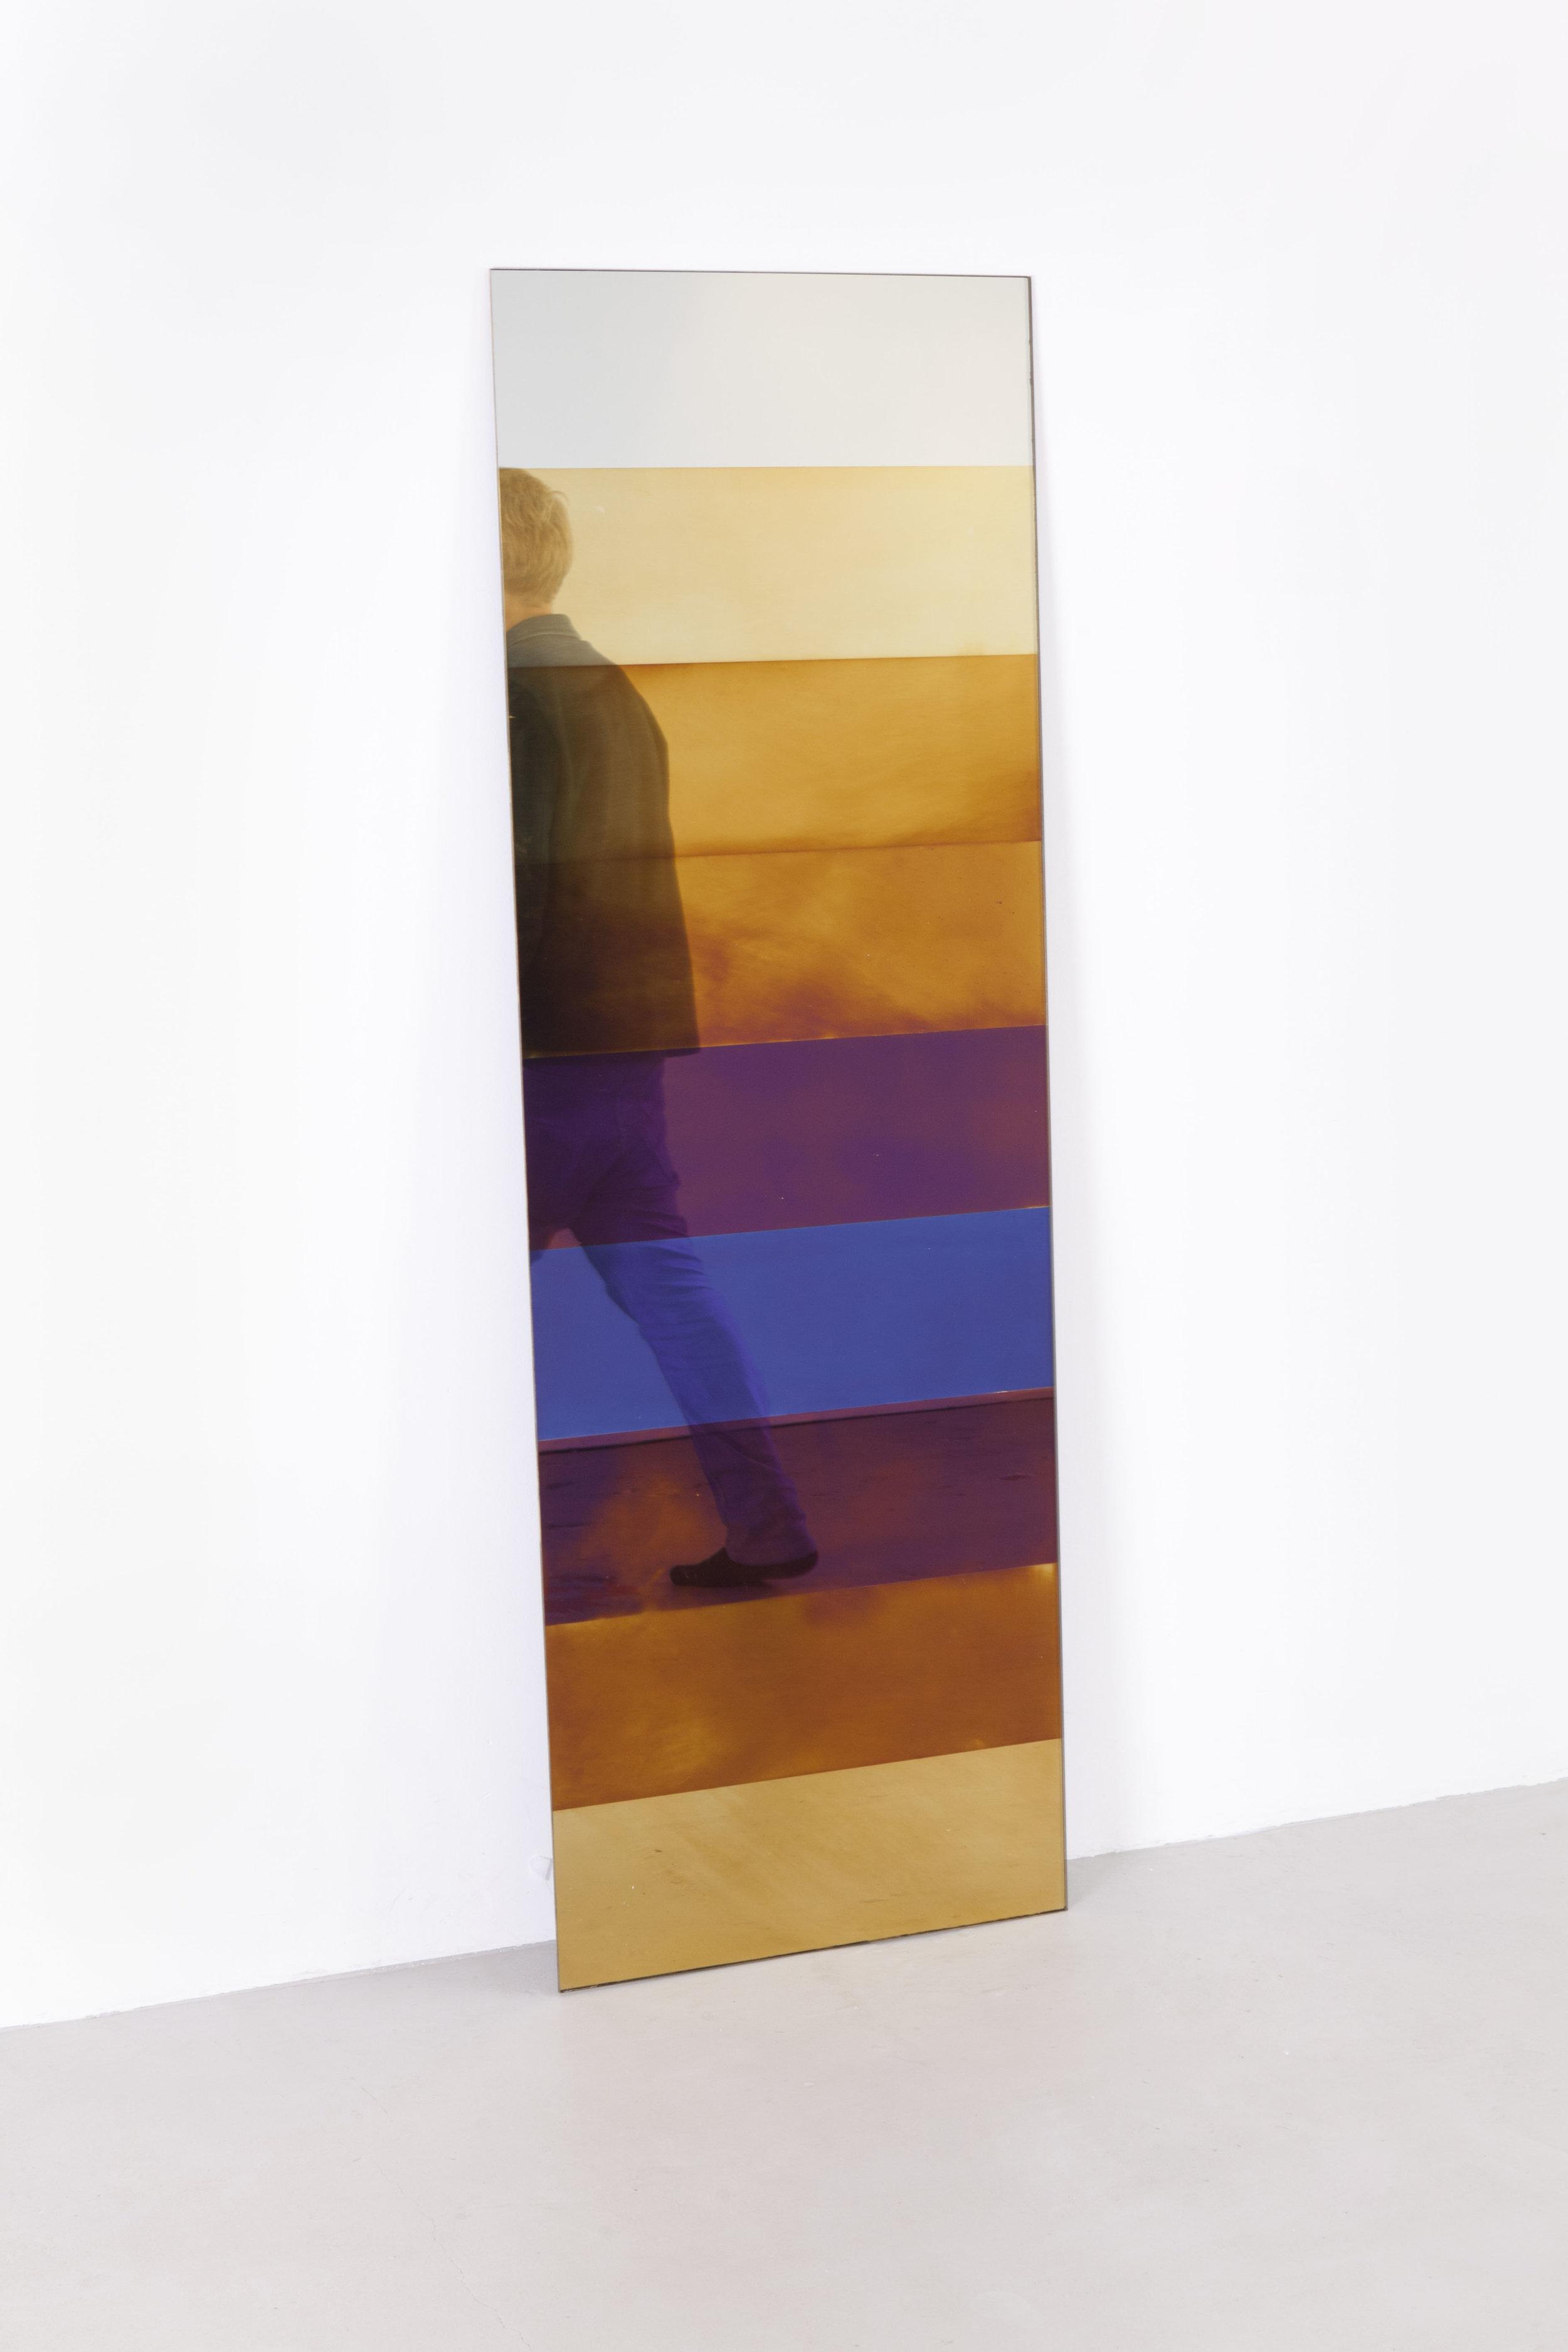 transnatural_Transience_mirror_rectangle+walk_byfloorknaapen_28.jpg